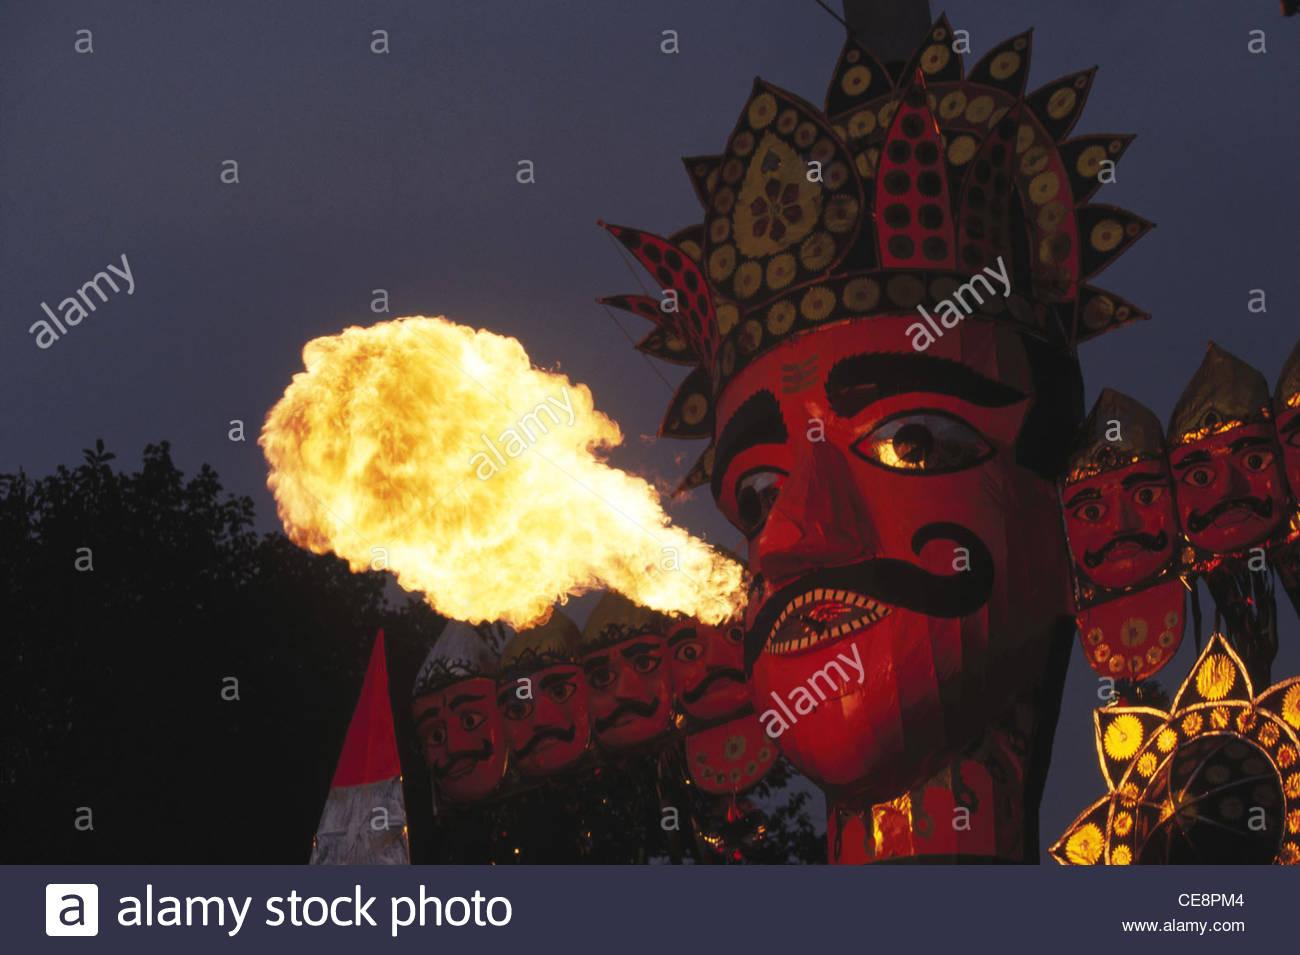 PYP 81237 Ravana Effigy Blowing Fire In Ramleela Dussera Dusera Indian Festival India